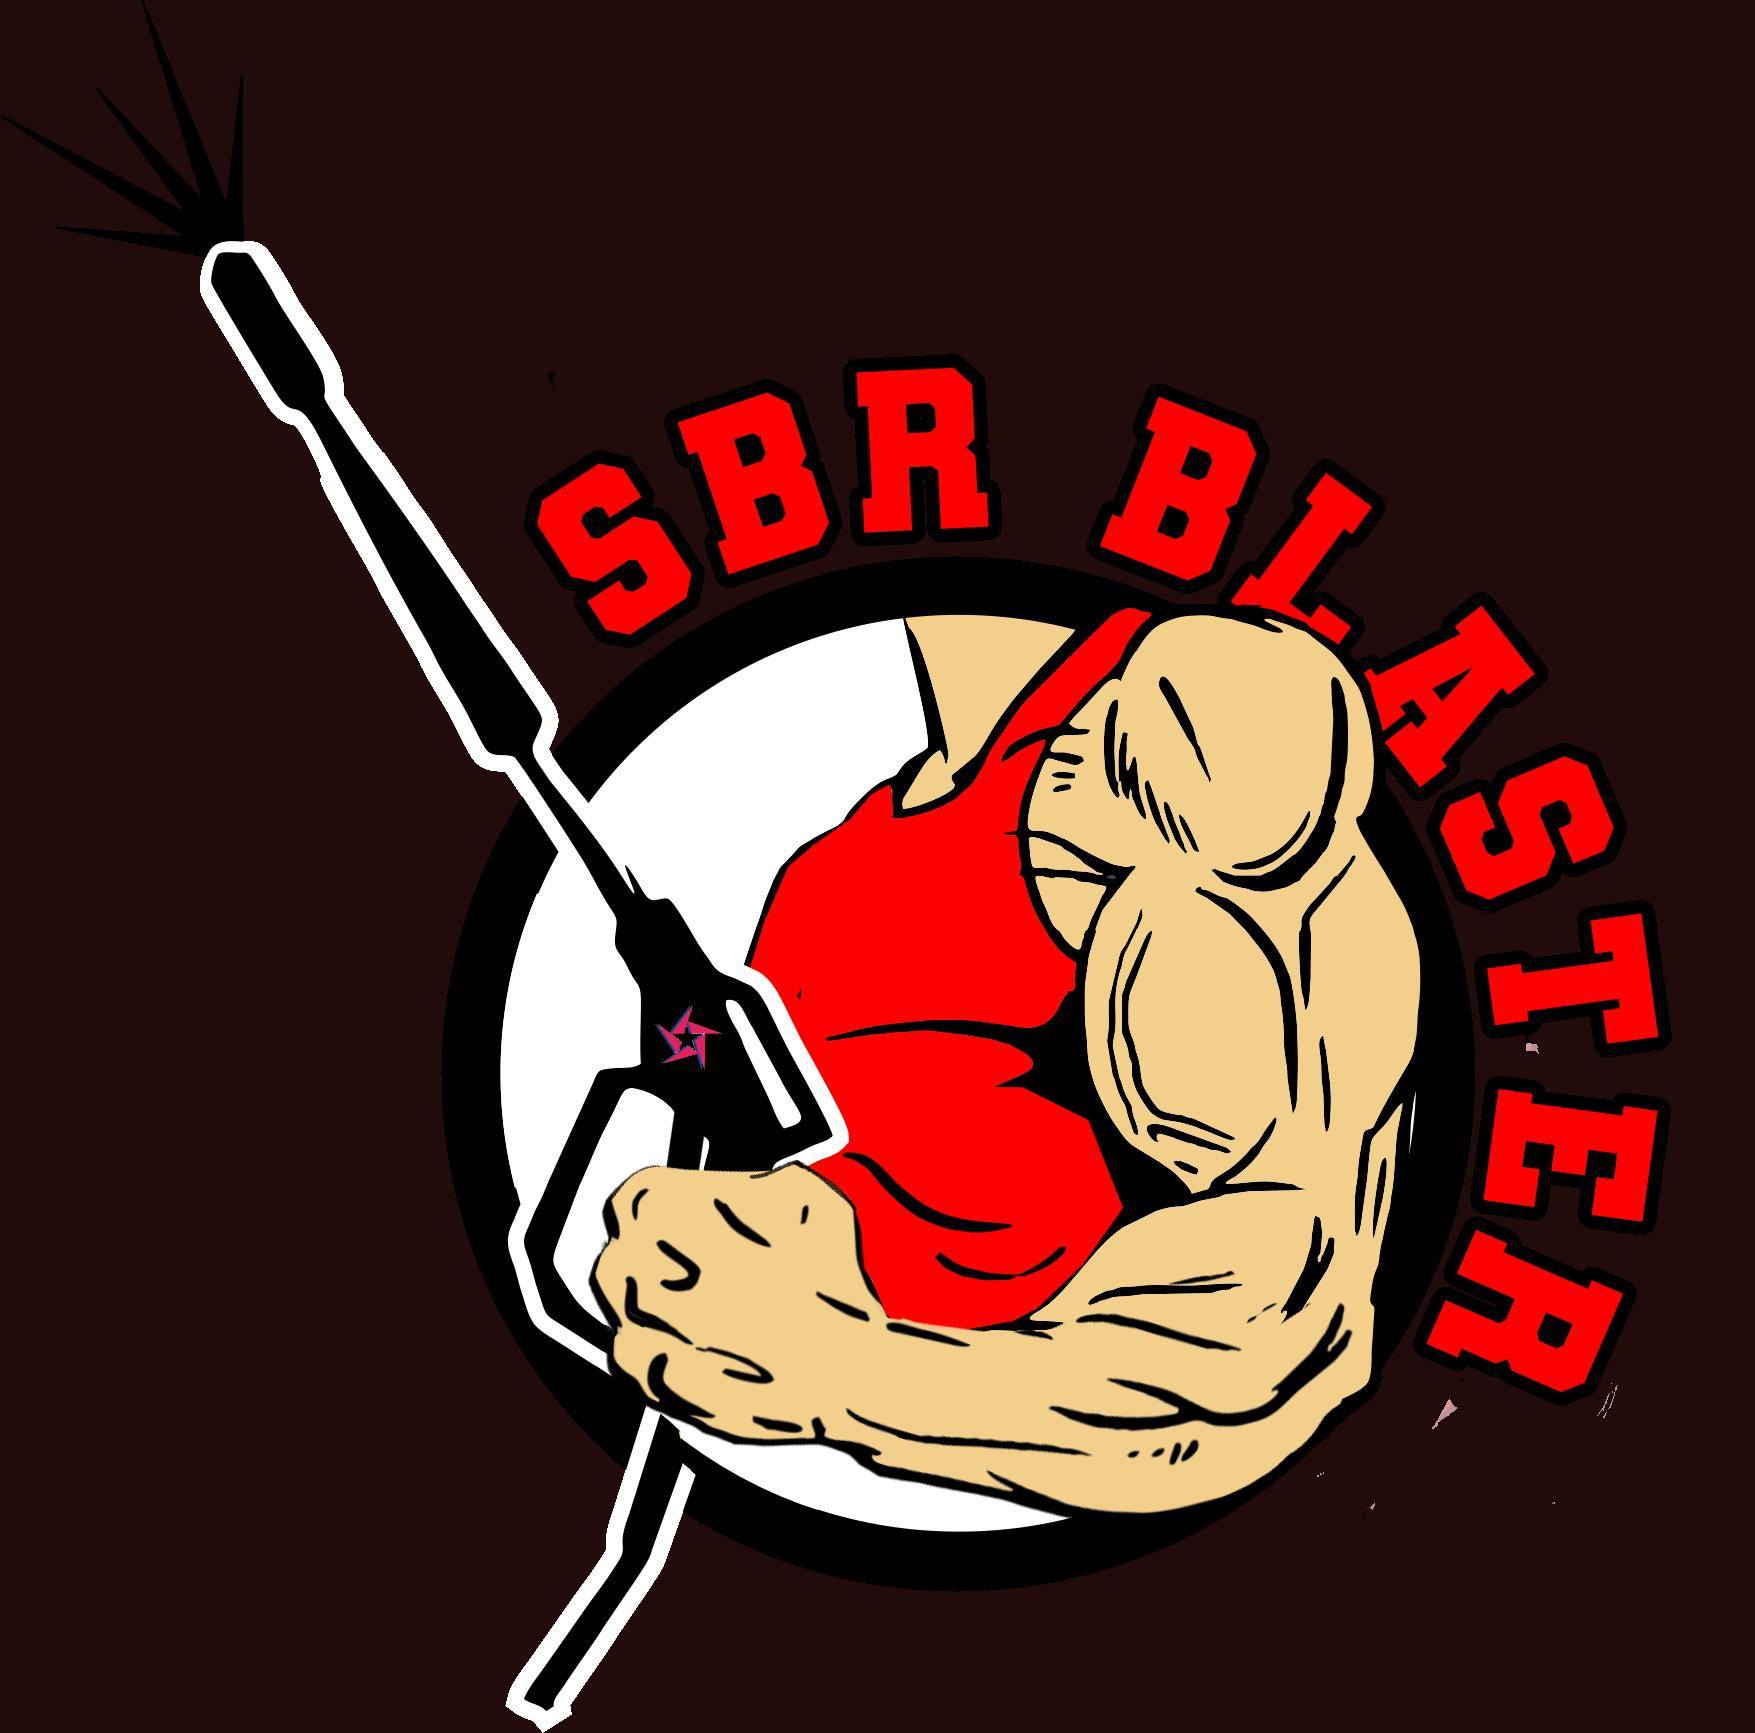 sbr blaster logo 2